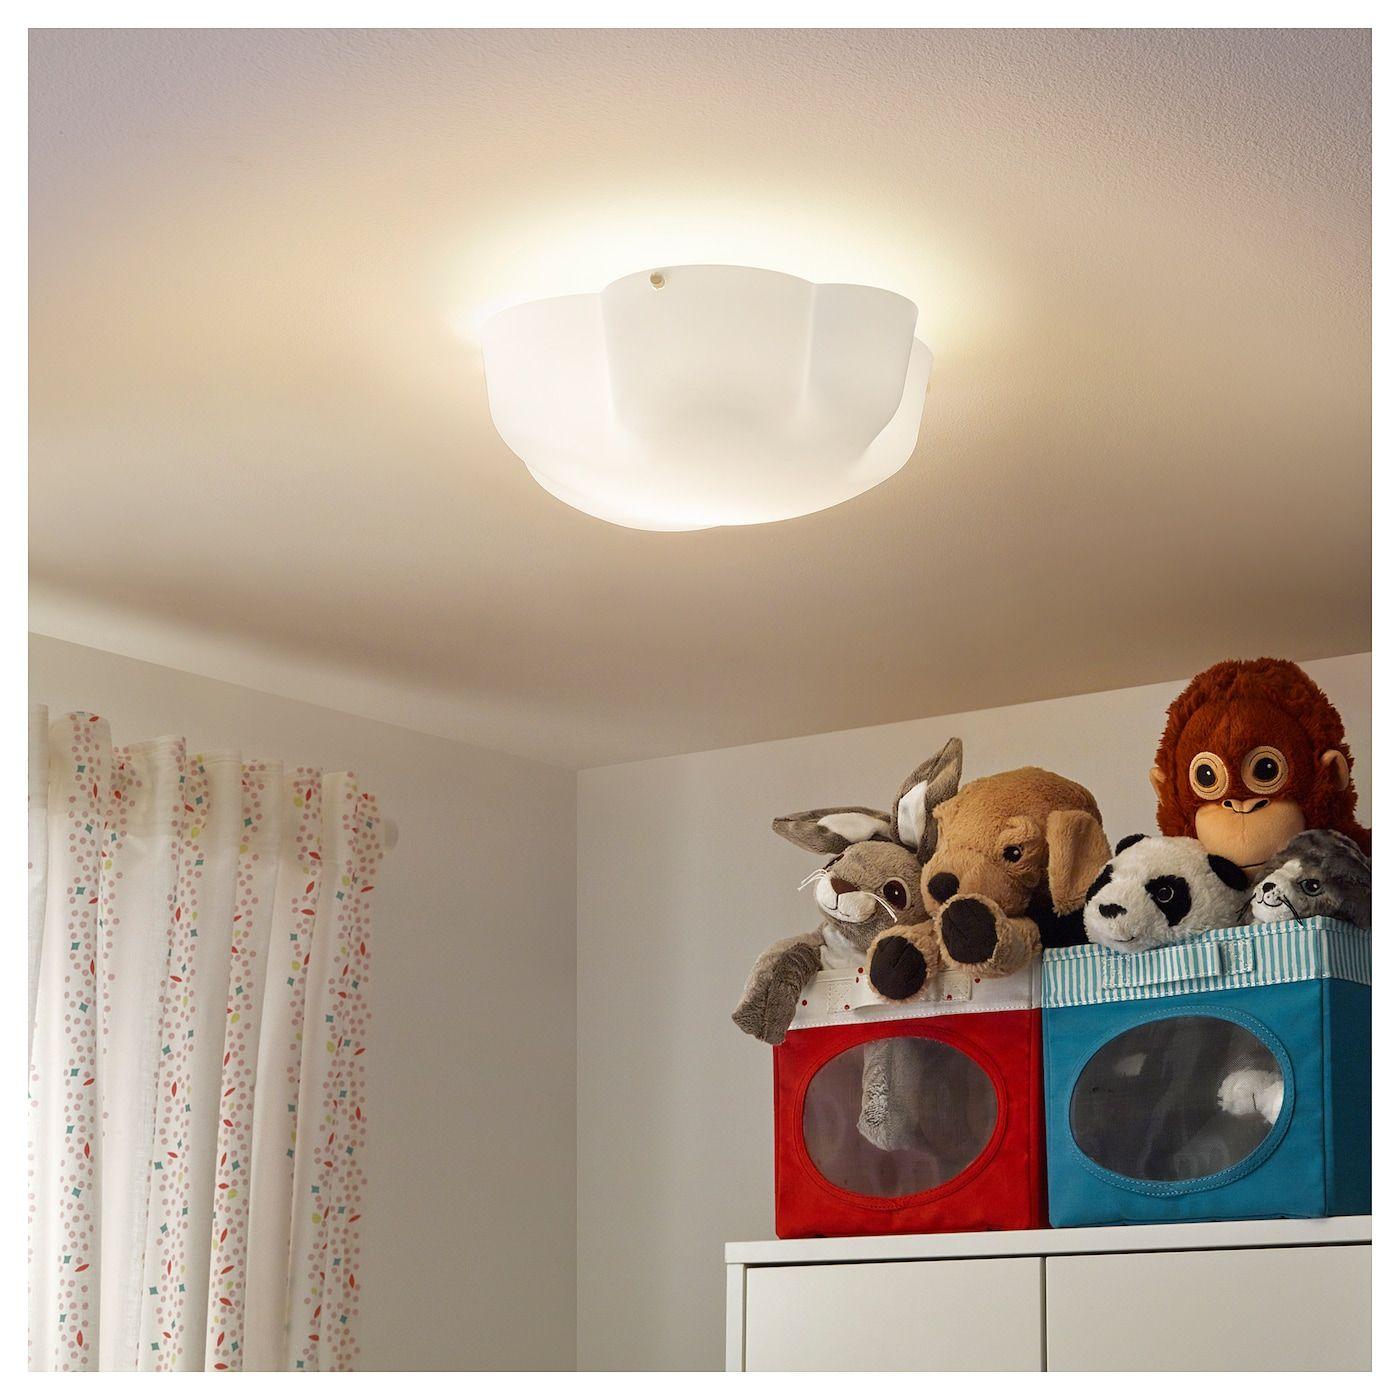 Ikea Yllesta Ceiling Lamp White Plafonnier Ikea Et Plafond